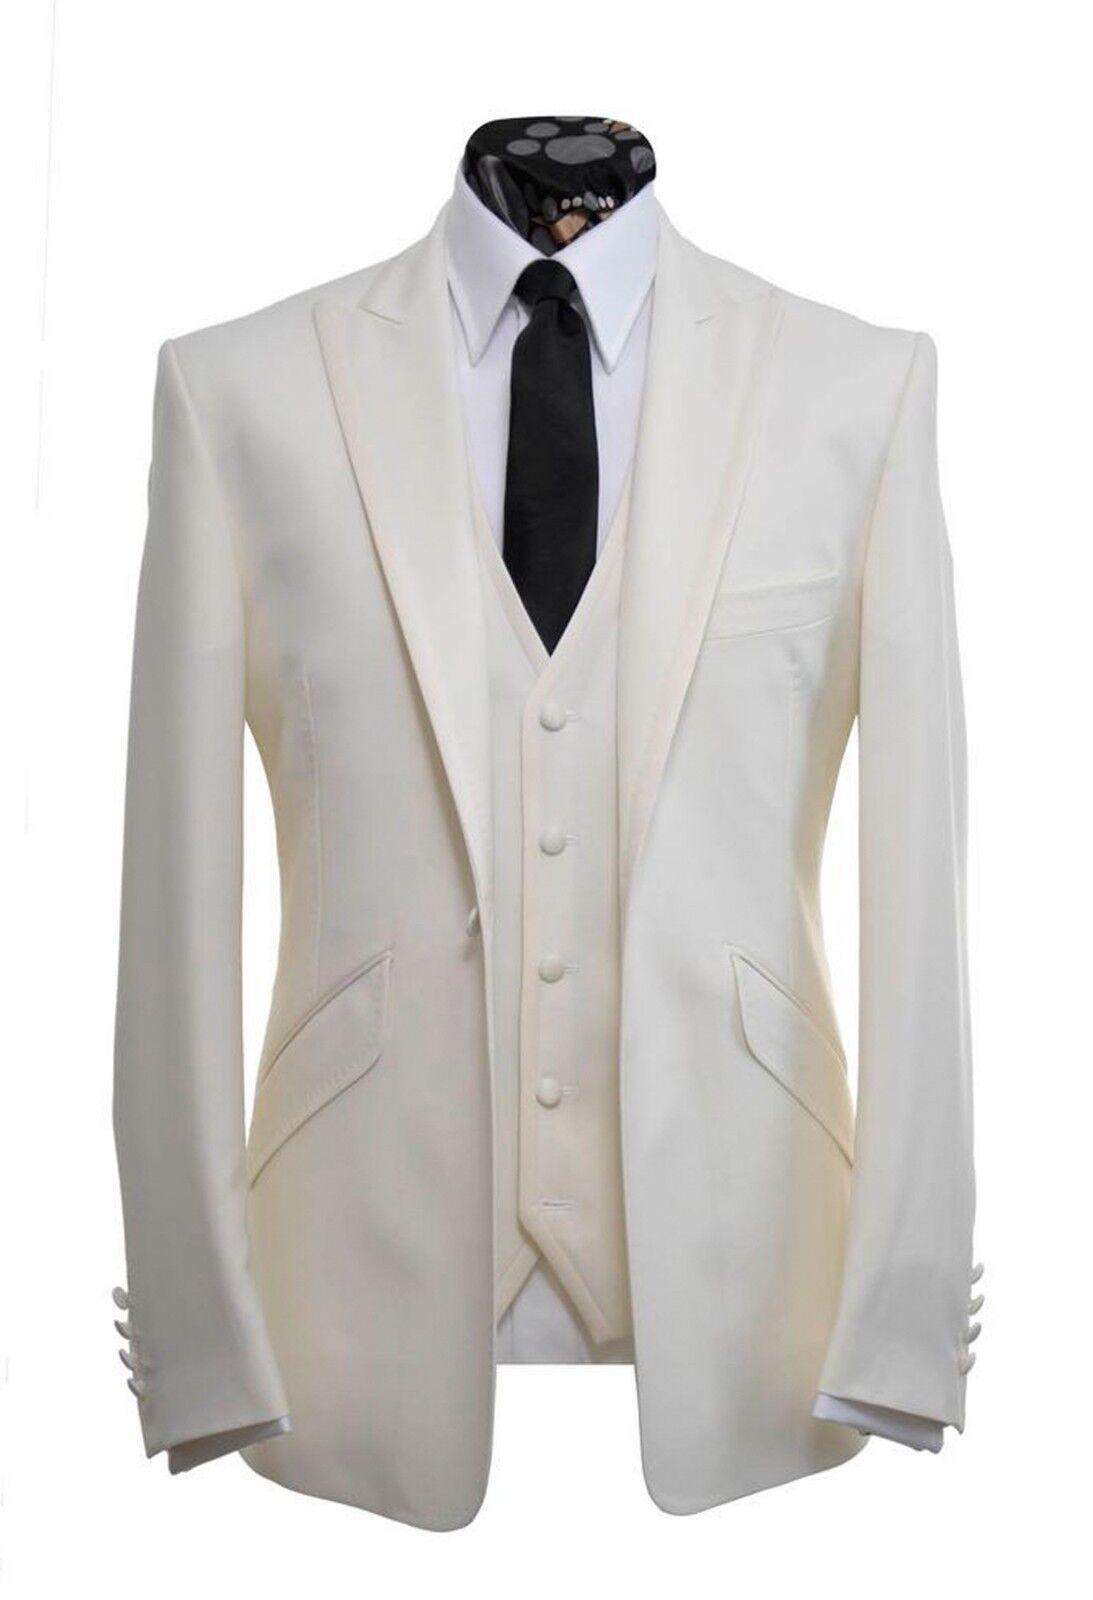 Men Ivory(Cream) Suits Designer Wedding Casual Dinner Suit (Coat+Waistcoat+Pant)